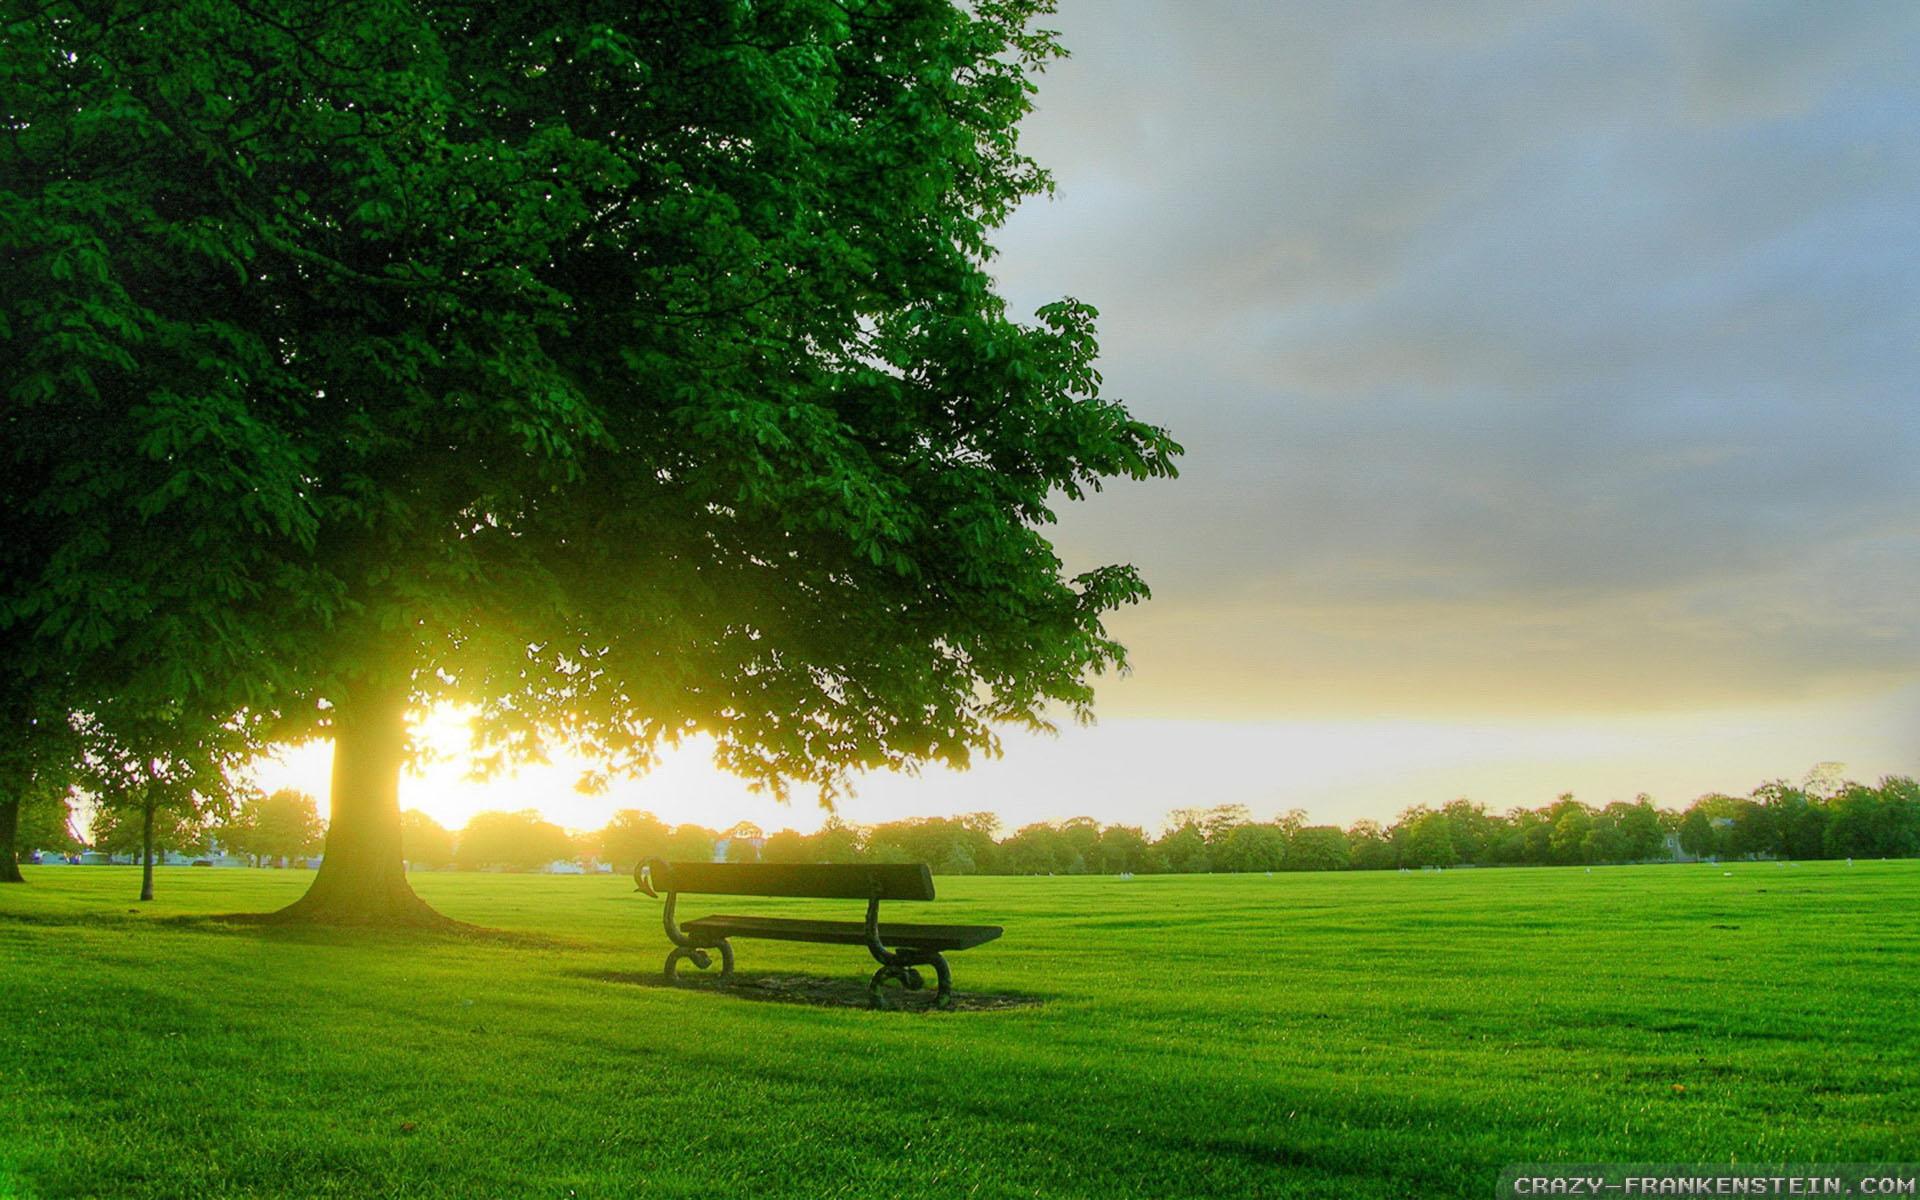 Wallpaper: Spring Field Sunrise Resolution: 1024x768 | 1280x1024 | 1600x1200. Widescreen Res: 1440x900 | 1680x1050 | 1920x1200